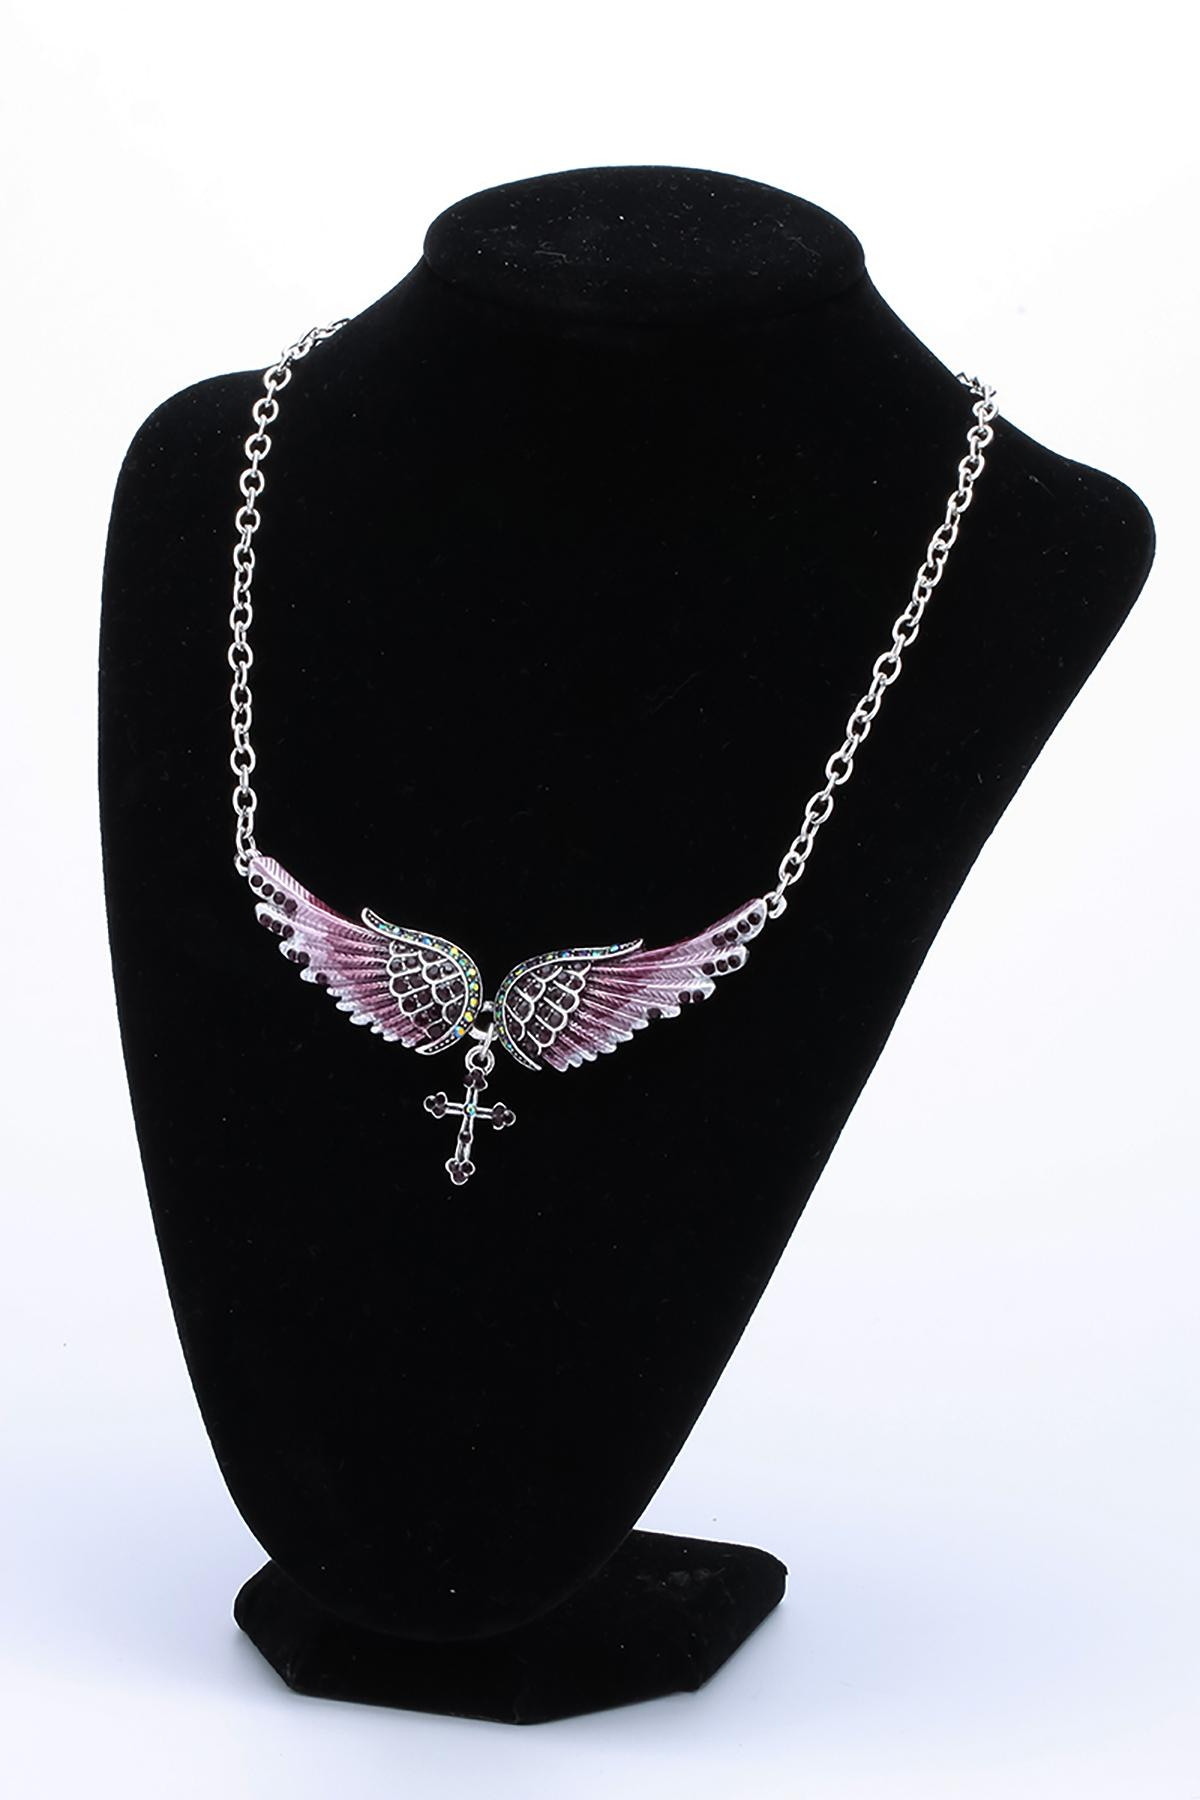 Yacq Angel Wing Cross Necklace Earrings Sets Women Biker Bling Jewelry Birthday Gifts for Her Wife Mom Girlfriend